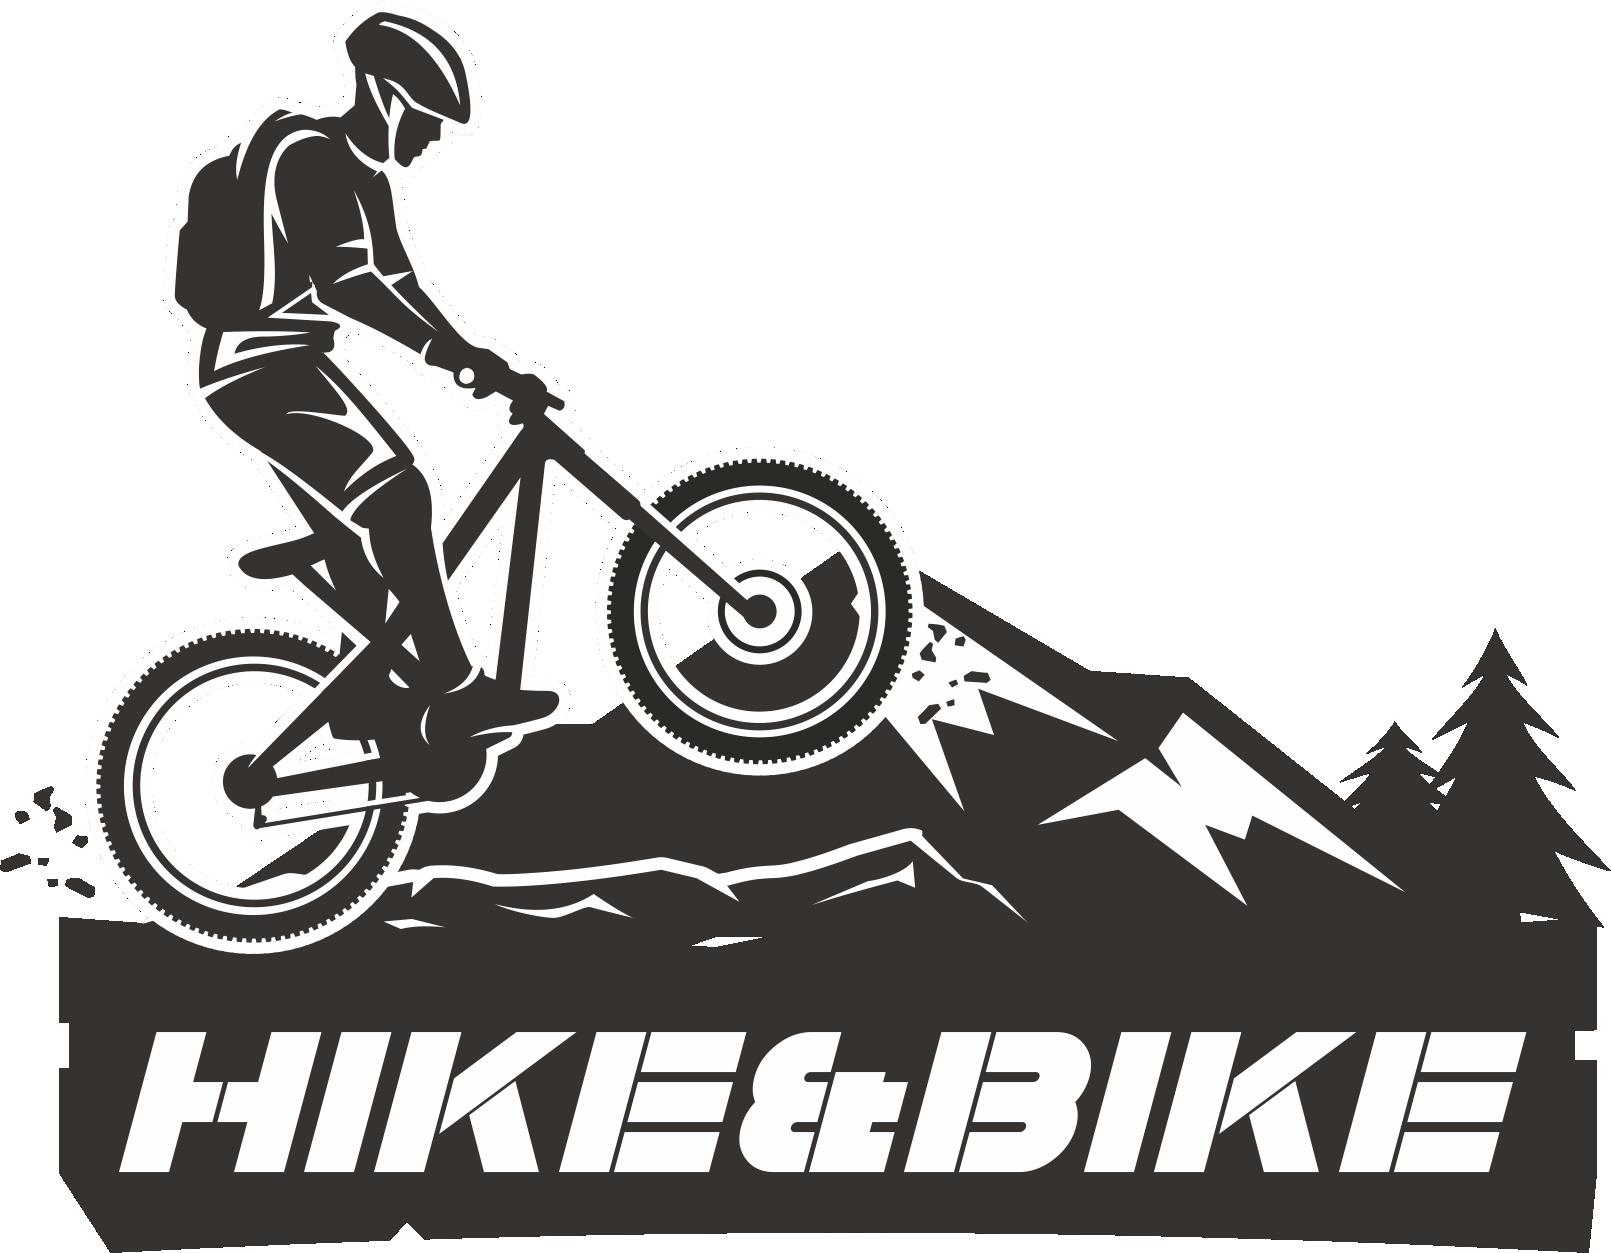 hikeandbike.eu